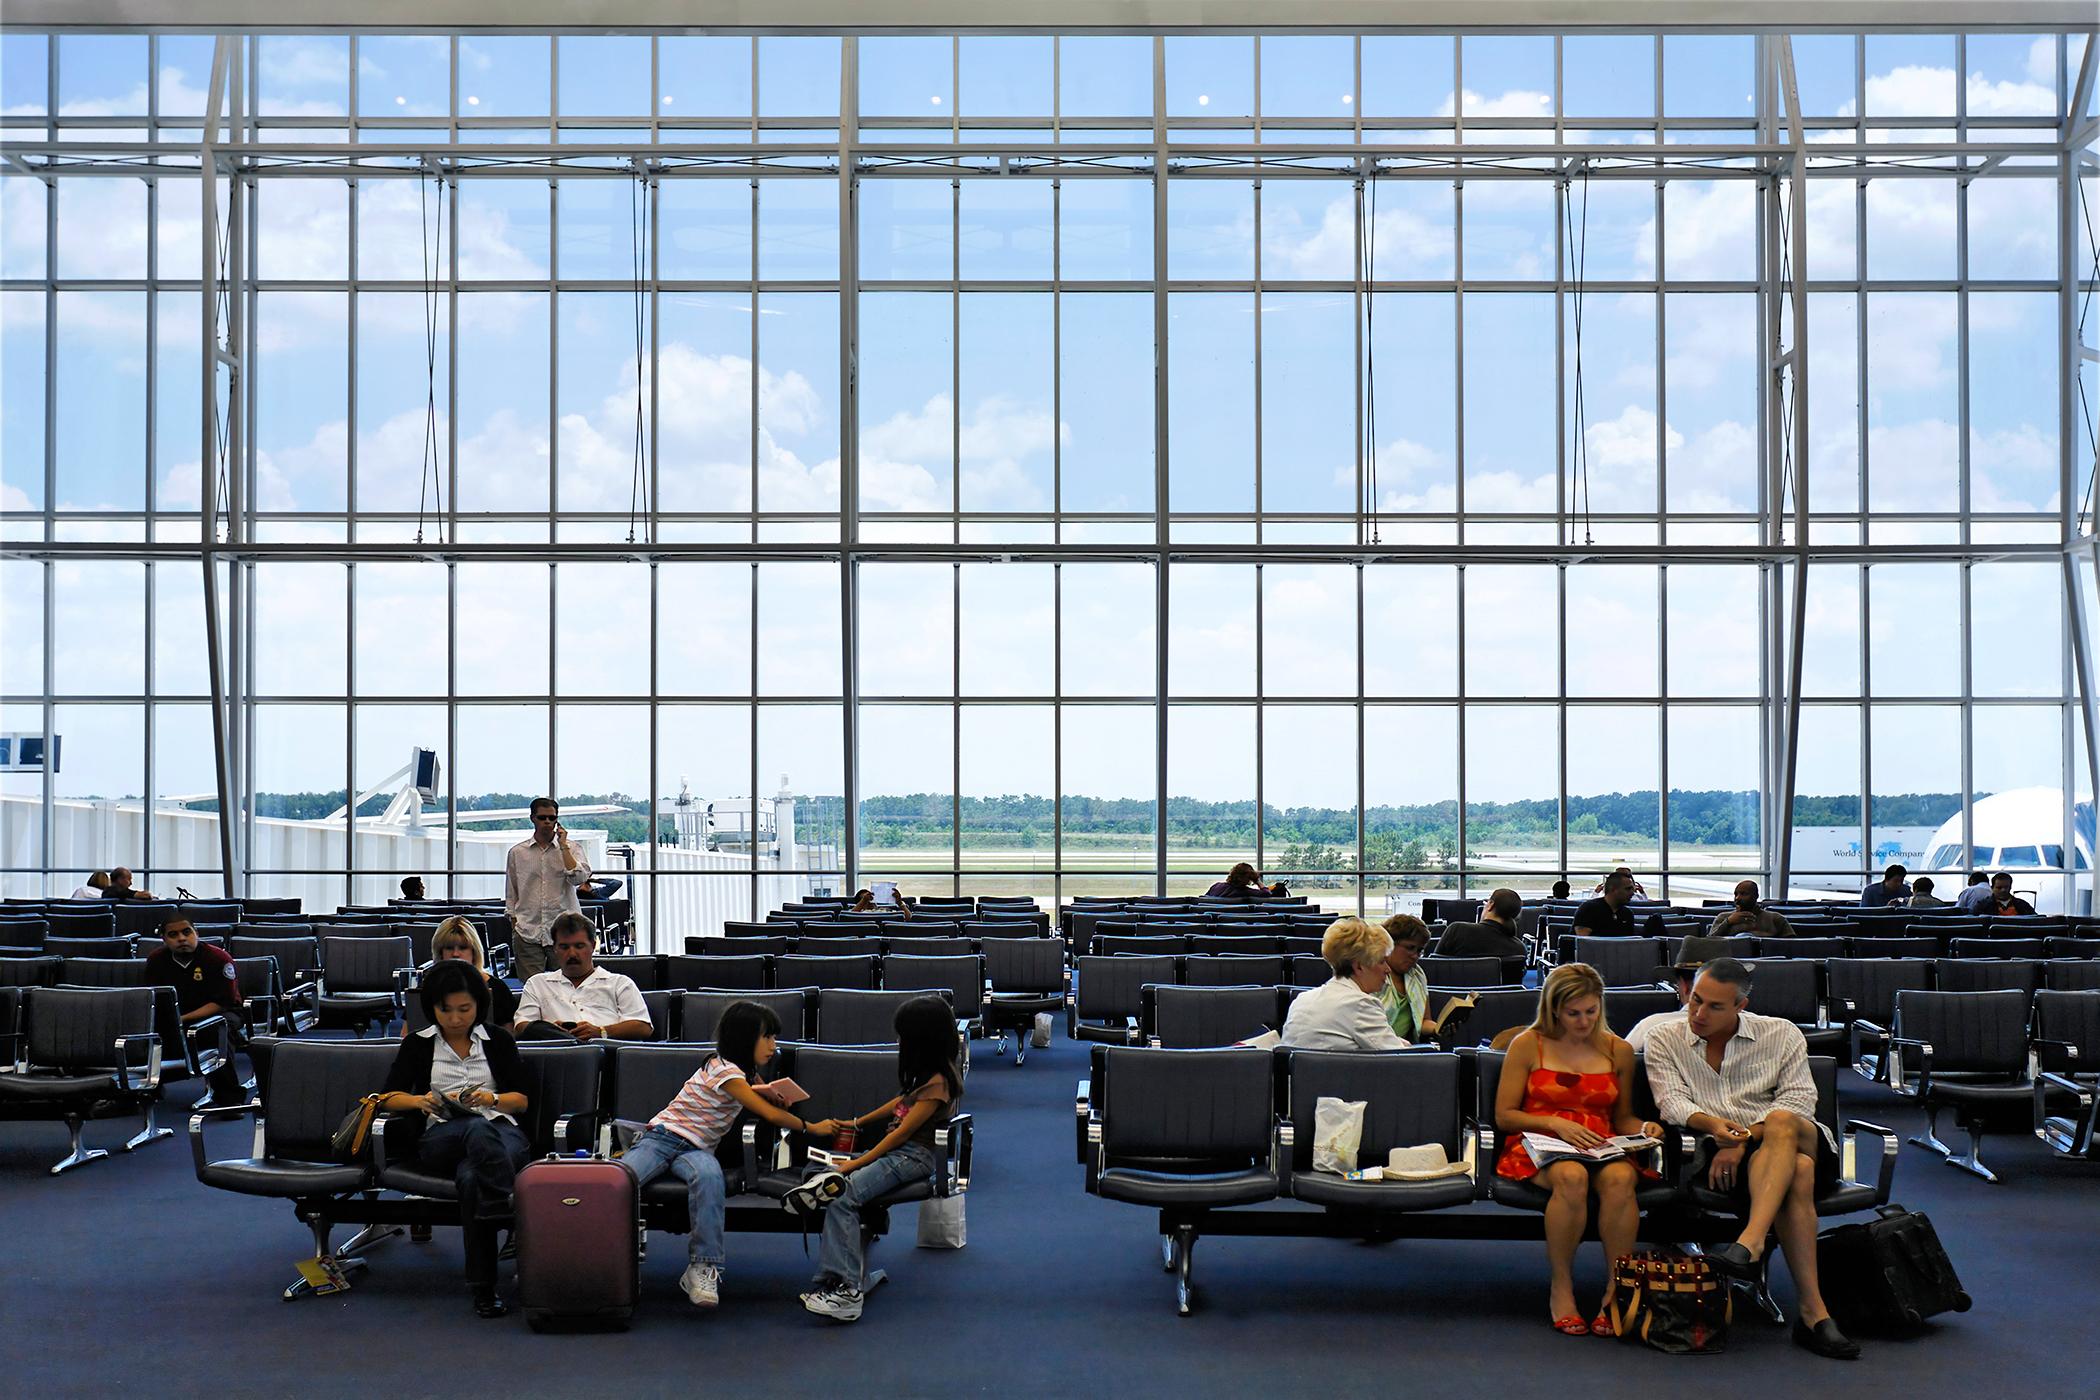 George W. Bush International Airport, Houston, Texas, USA